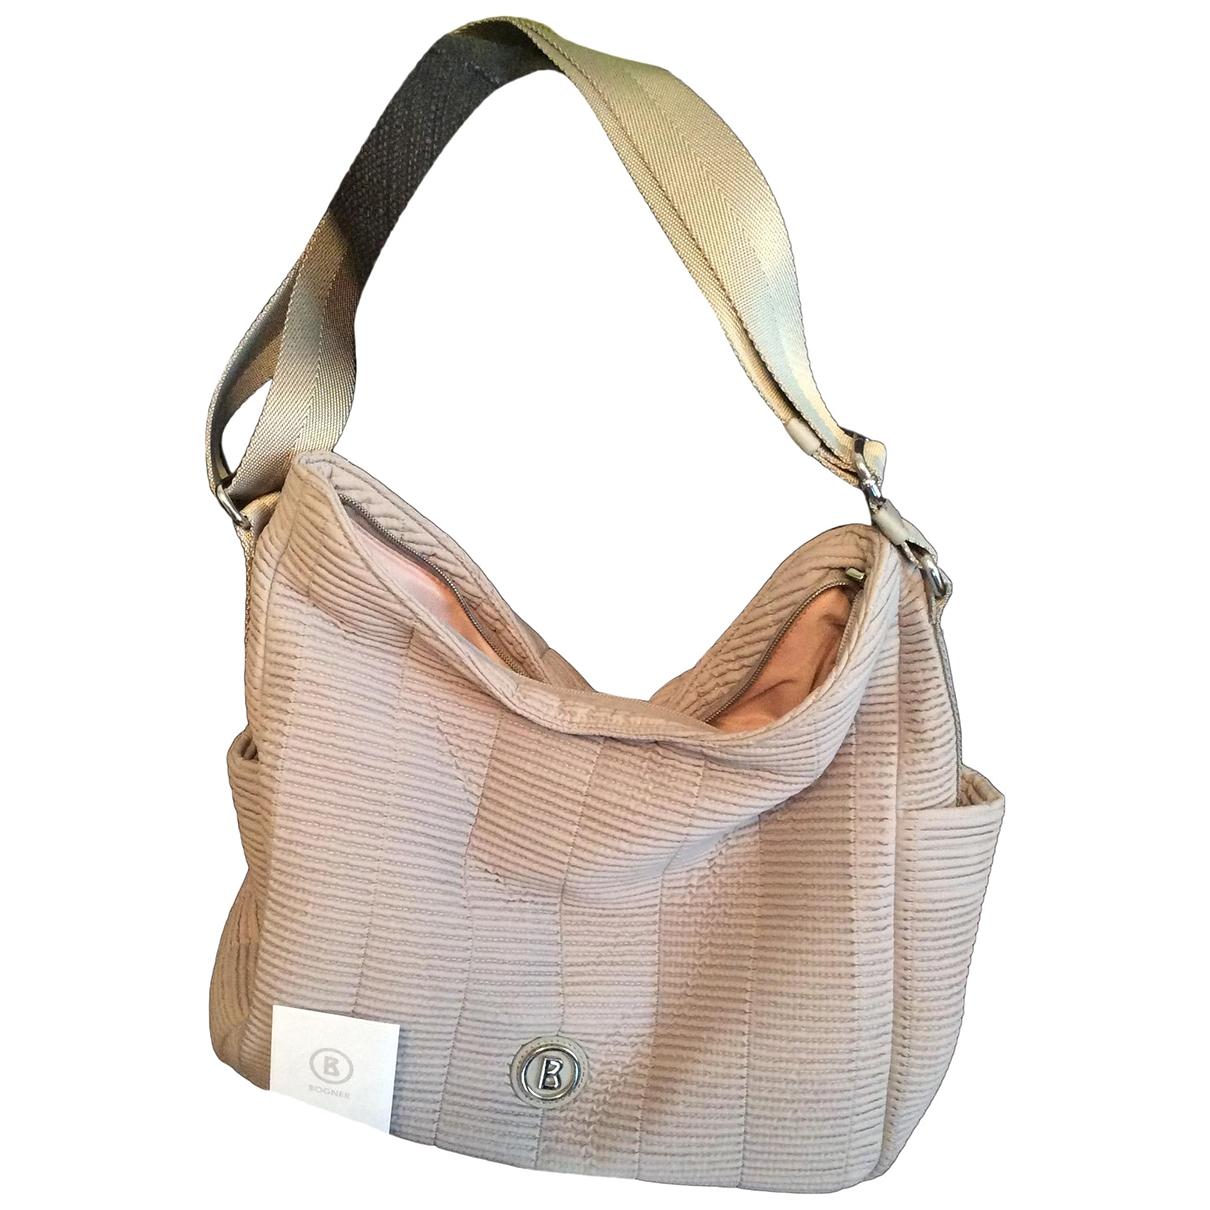 Bogner \N Grey handbag for Women \N